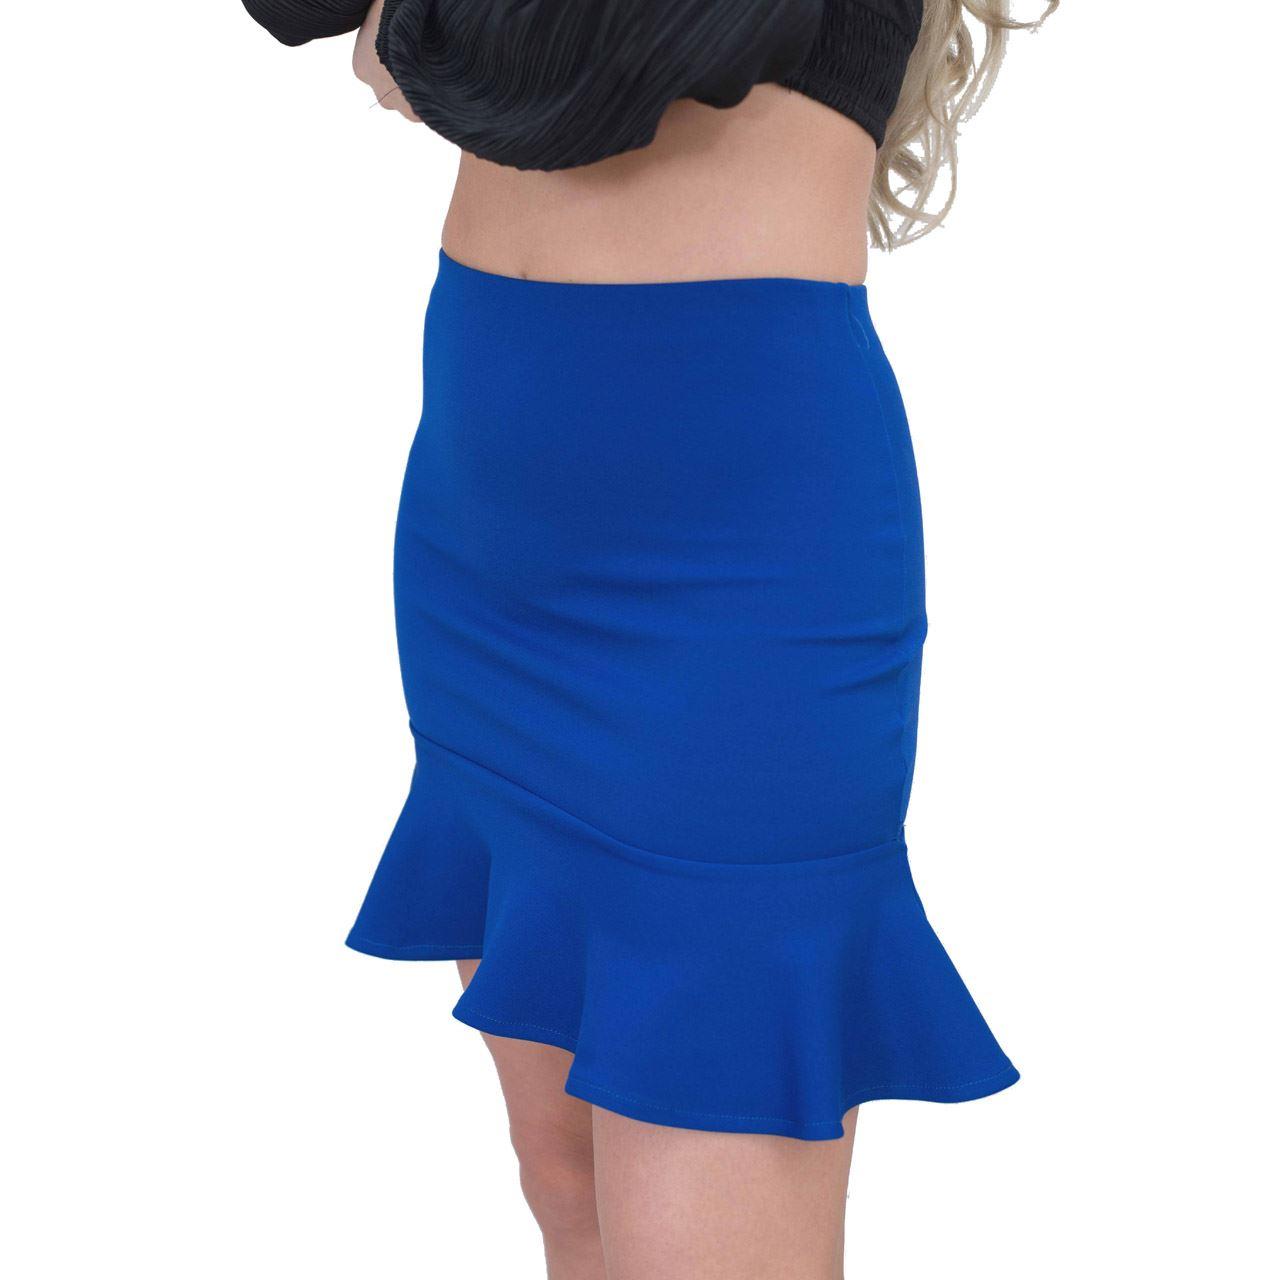 Jolie Max Damen Meerjungfrau-Linie Minirock Stretch Bodycon Plissiert